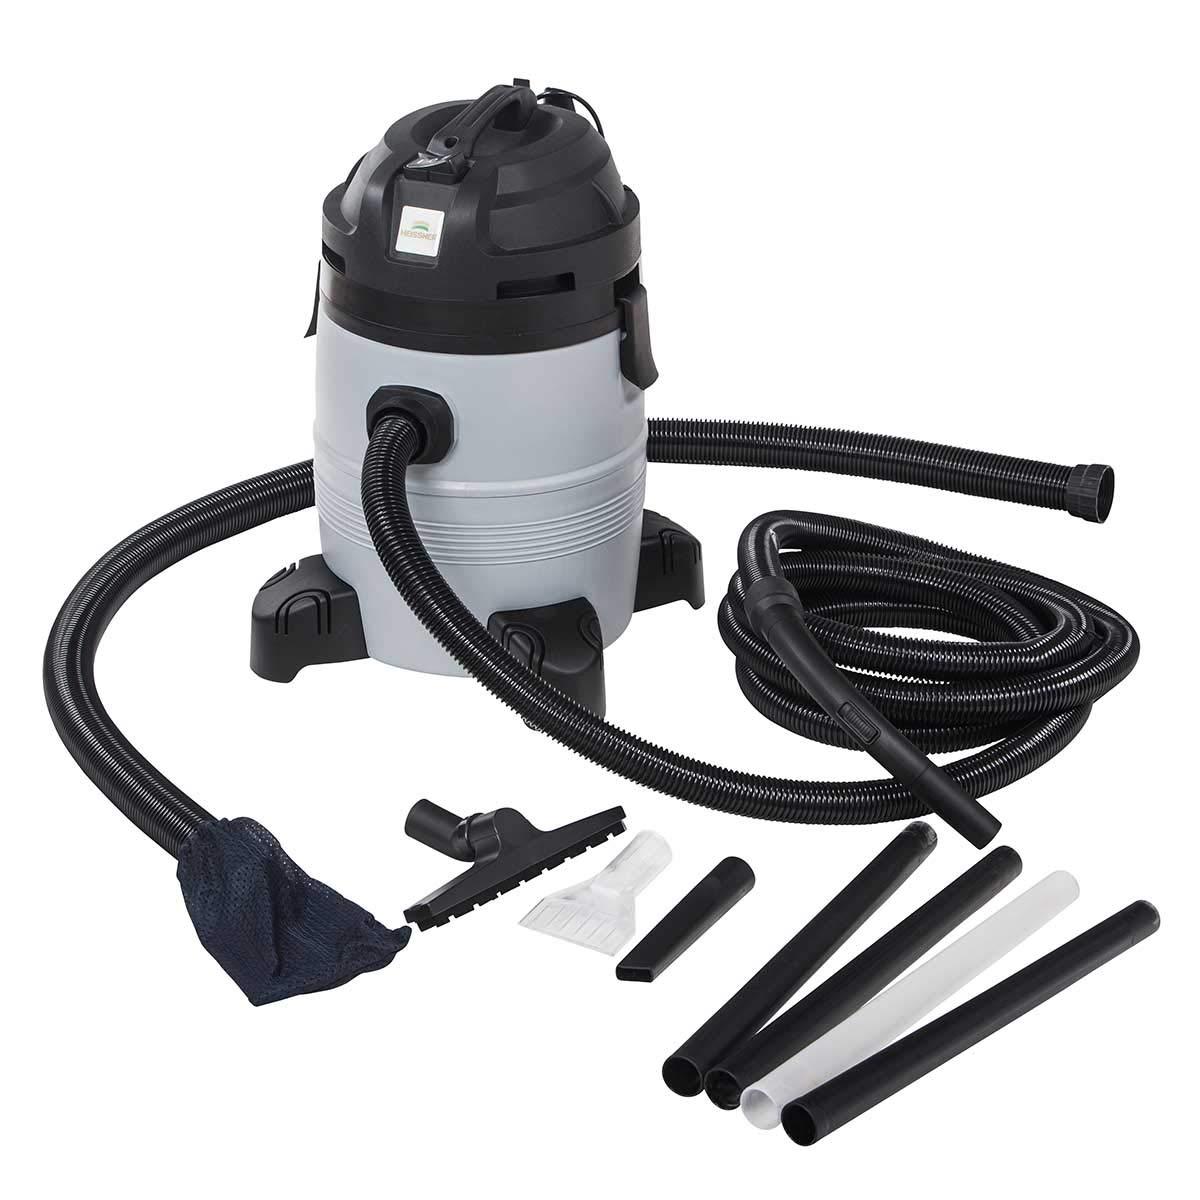 Certikin International Ltd Heissner F635N-00 1600W Pond Cleaner